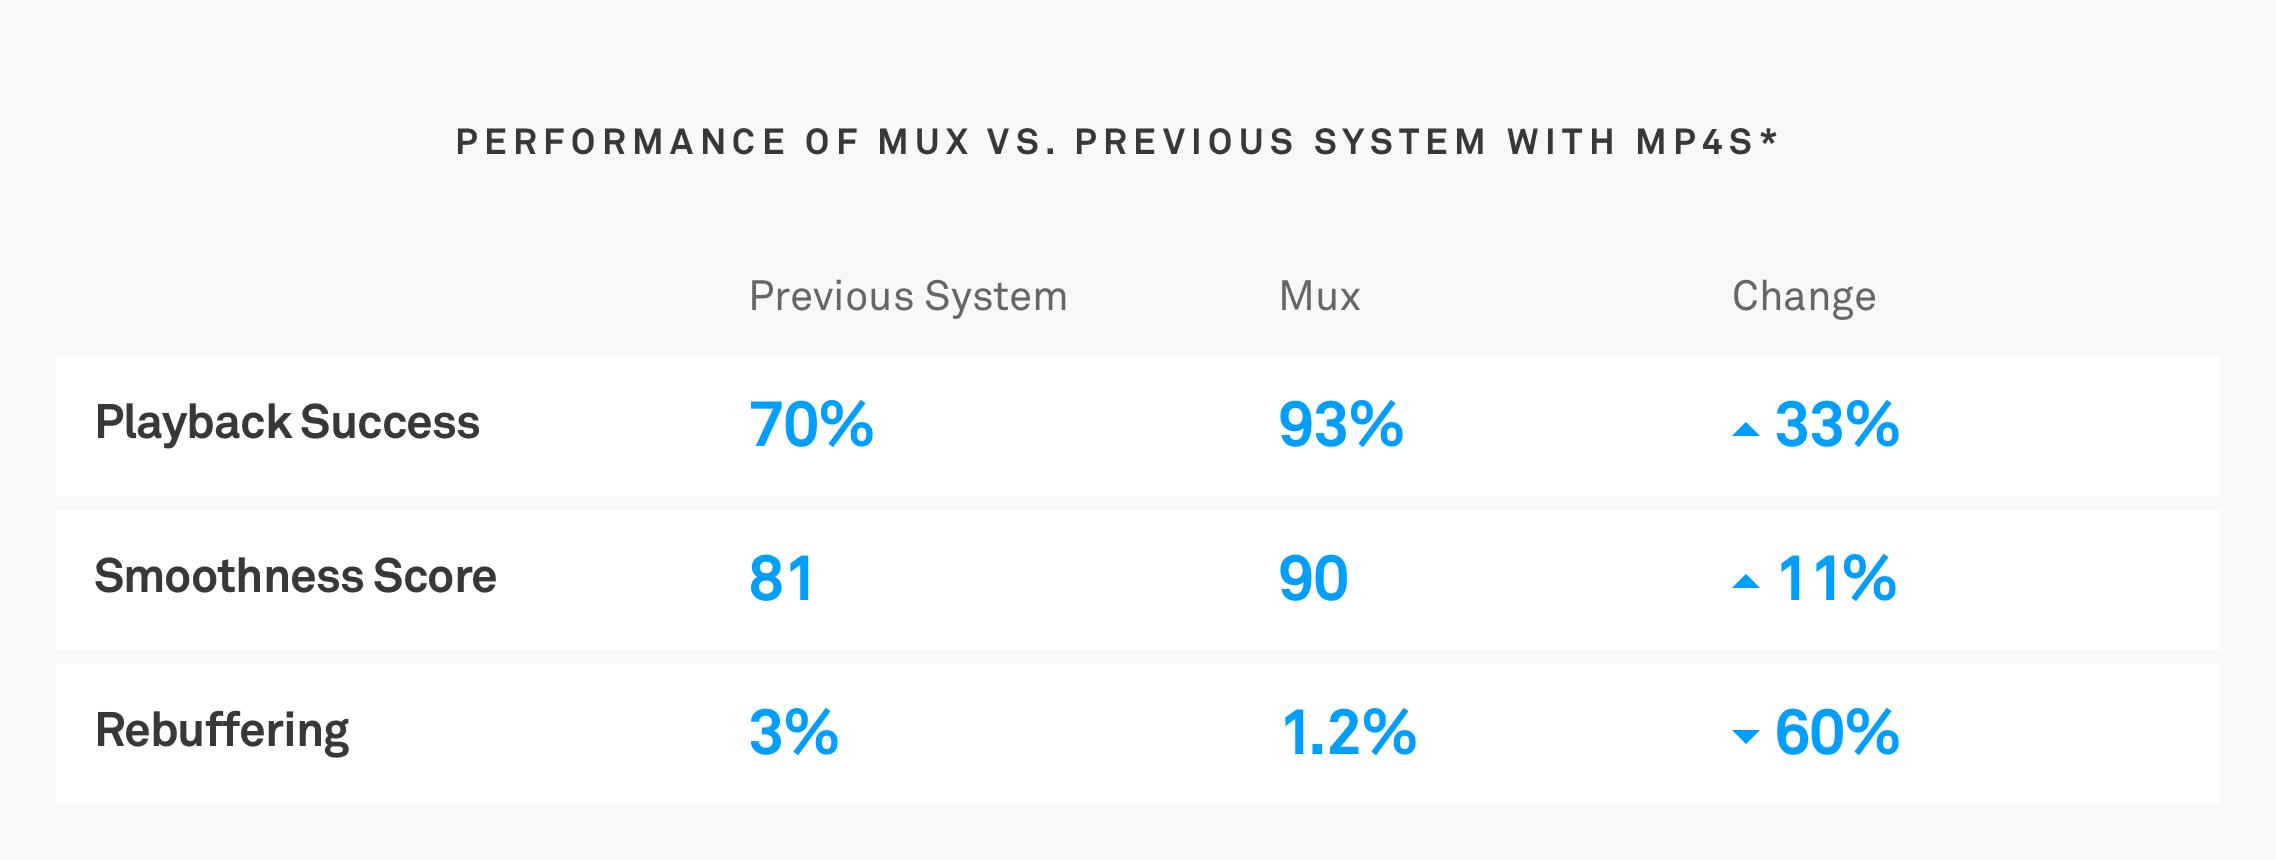 Mux vs. Old platform